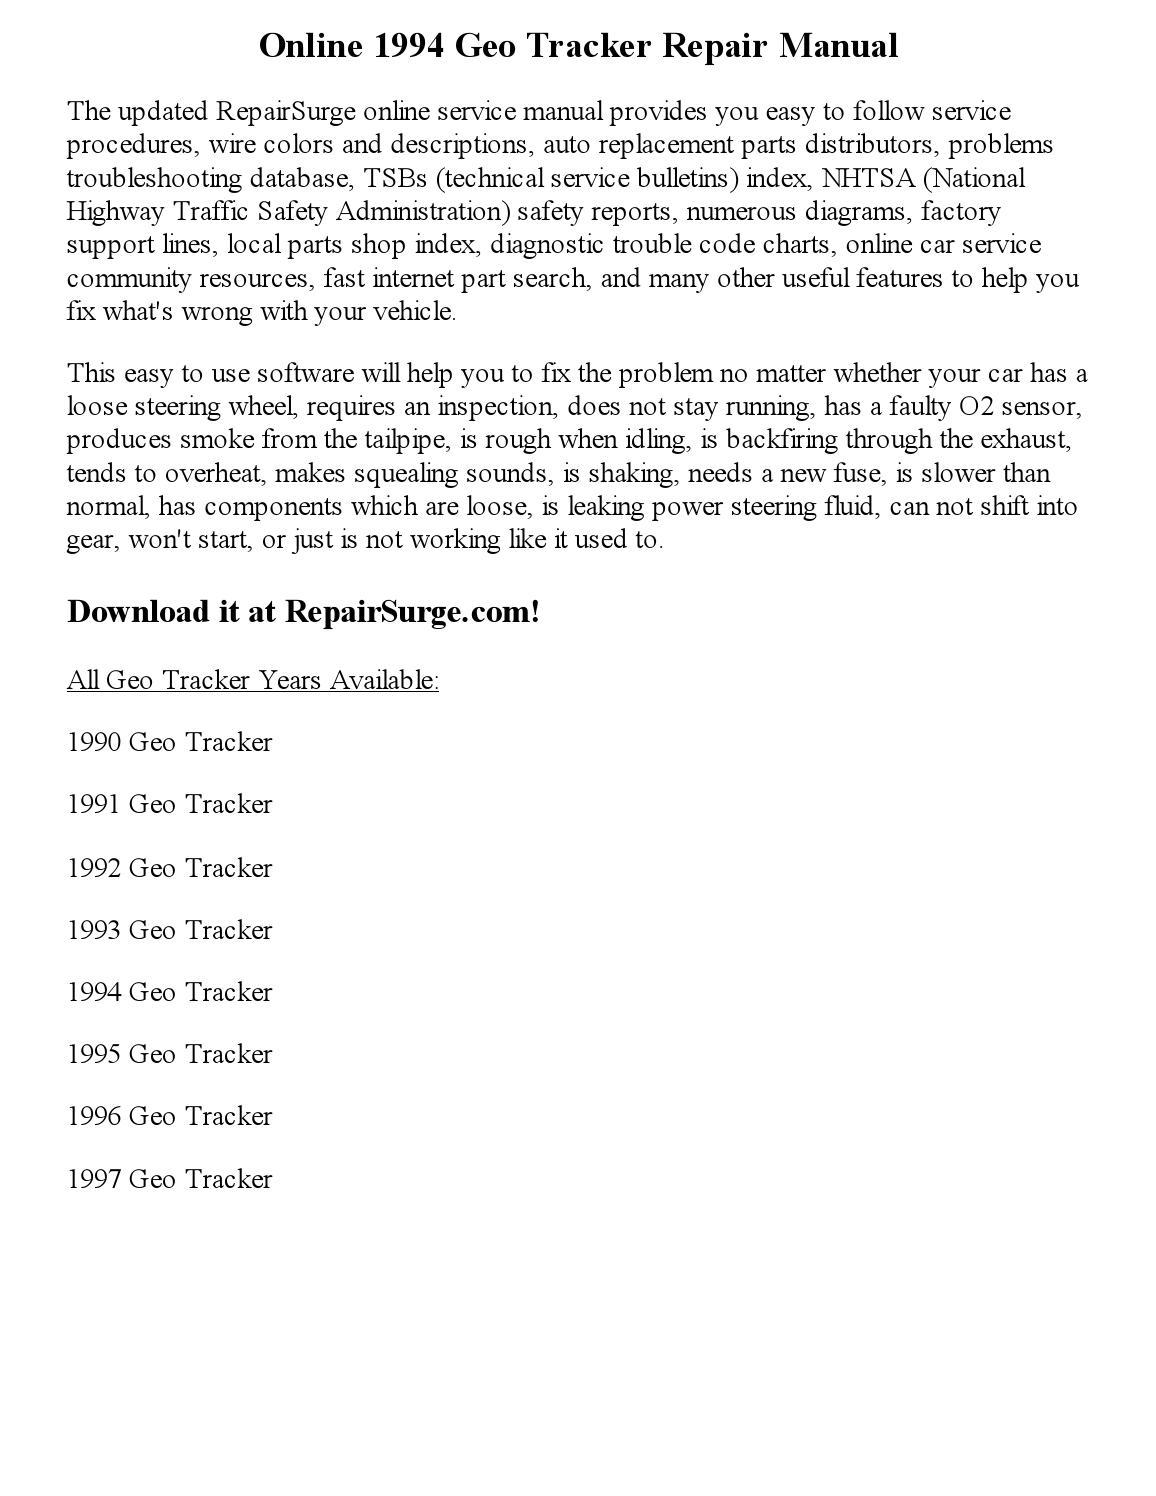 1994 Geo Tracker Repair Manual Online By Robertjames Smith